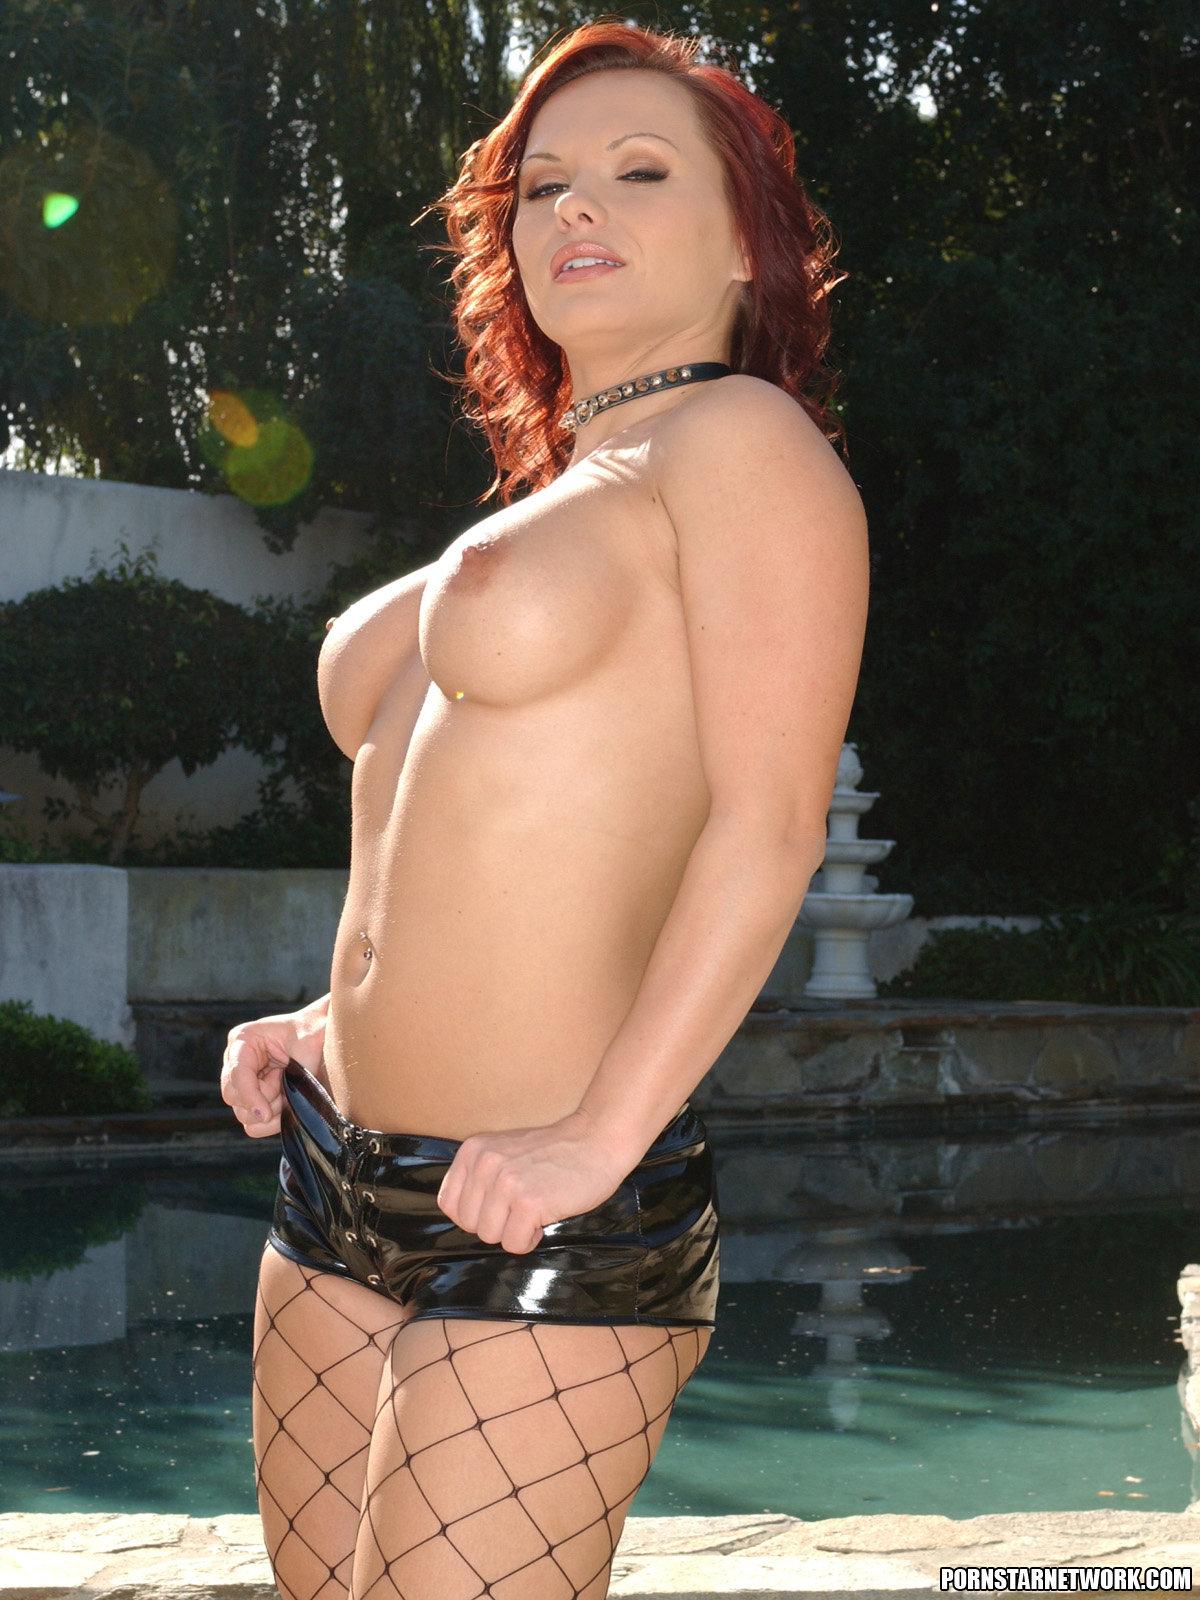 Katja kassin nude, topless pictures, playboy photos, sex scene uncensored